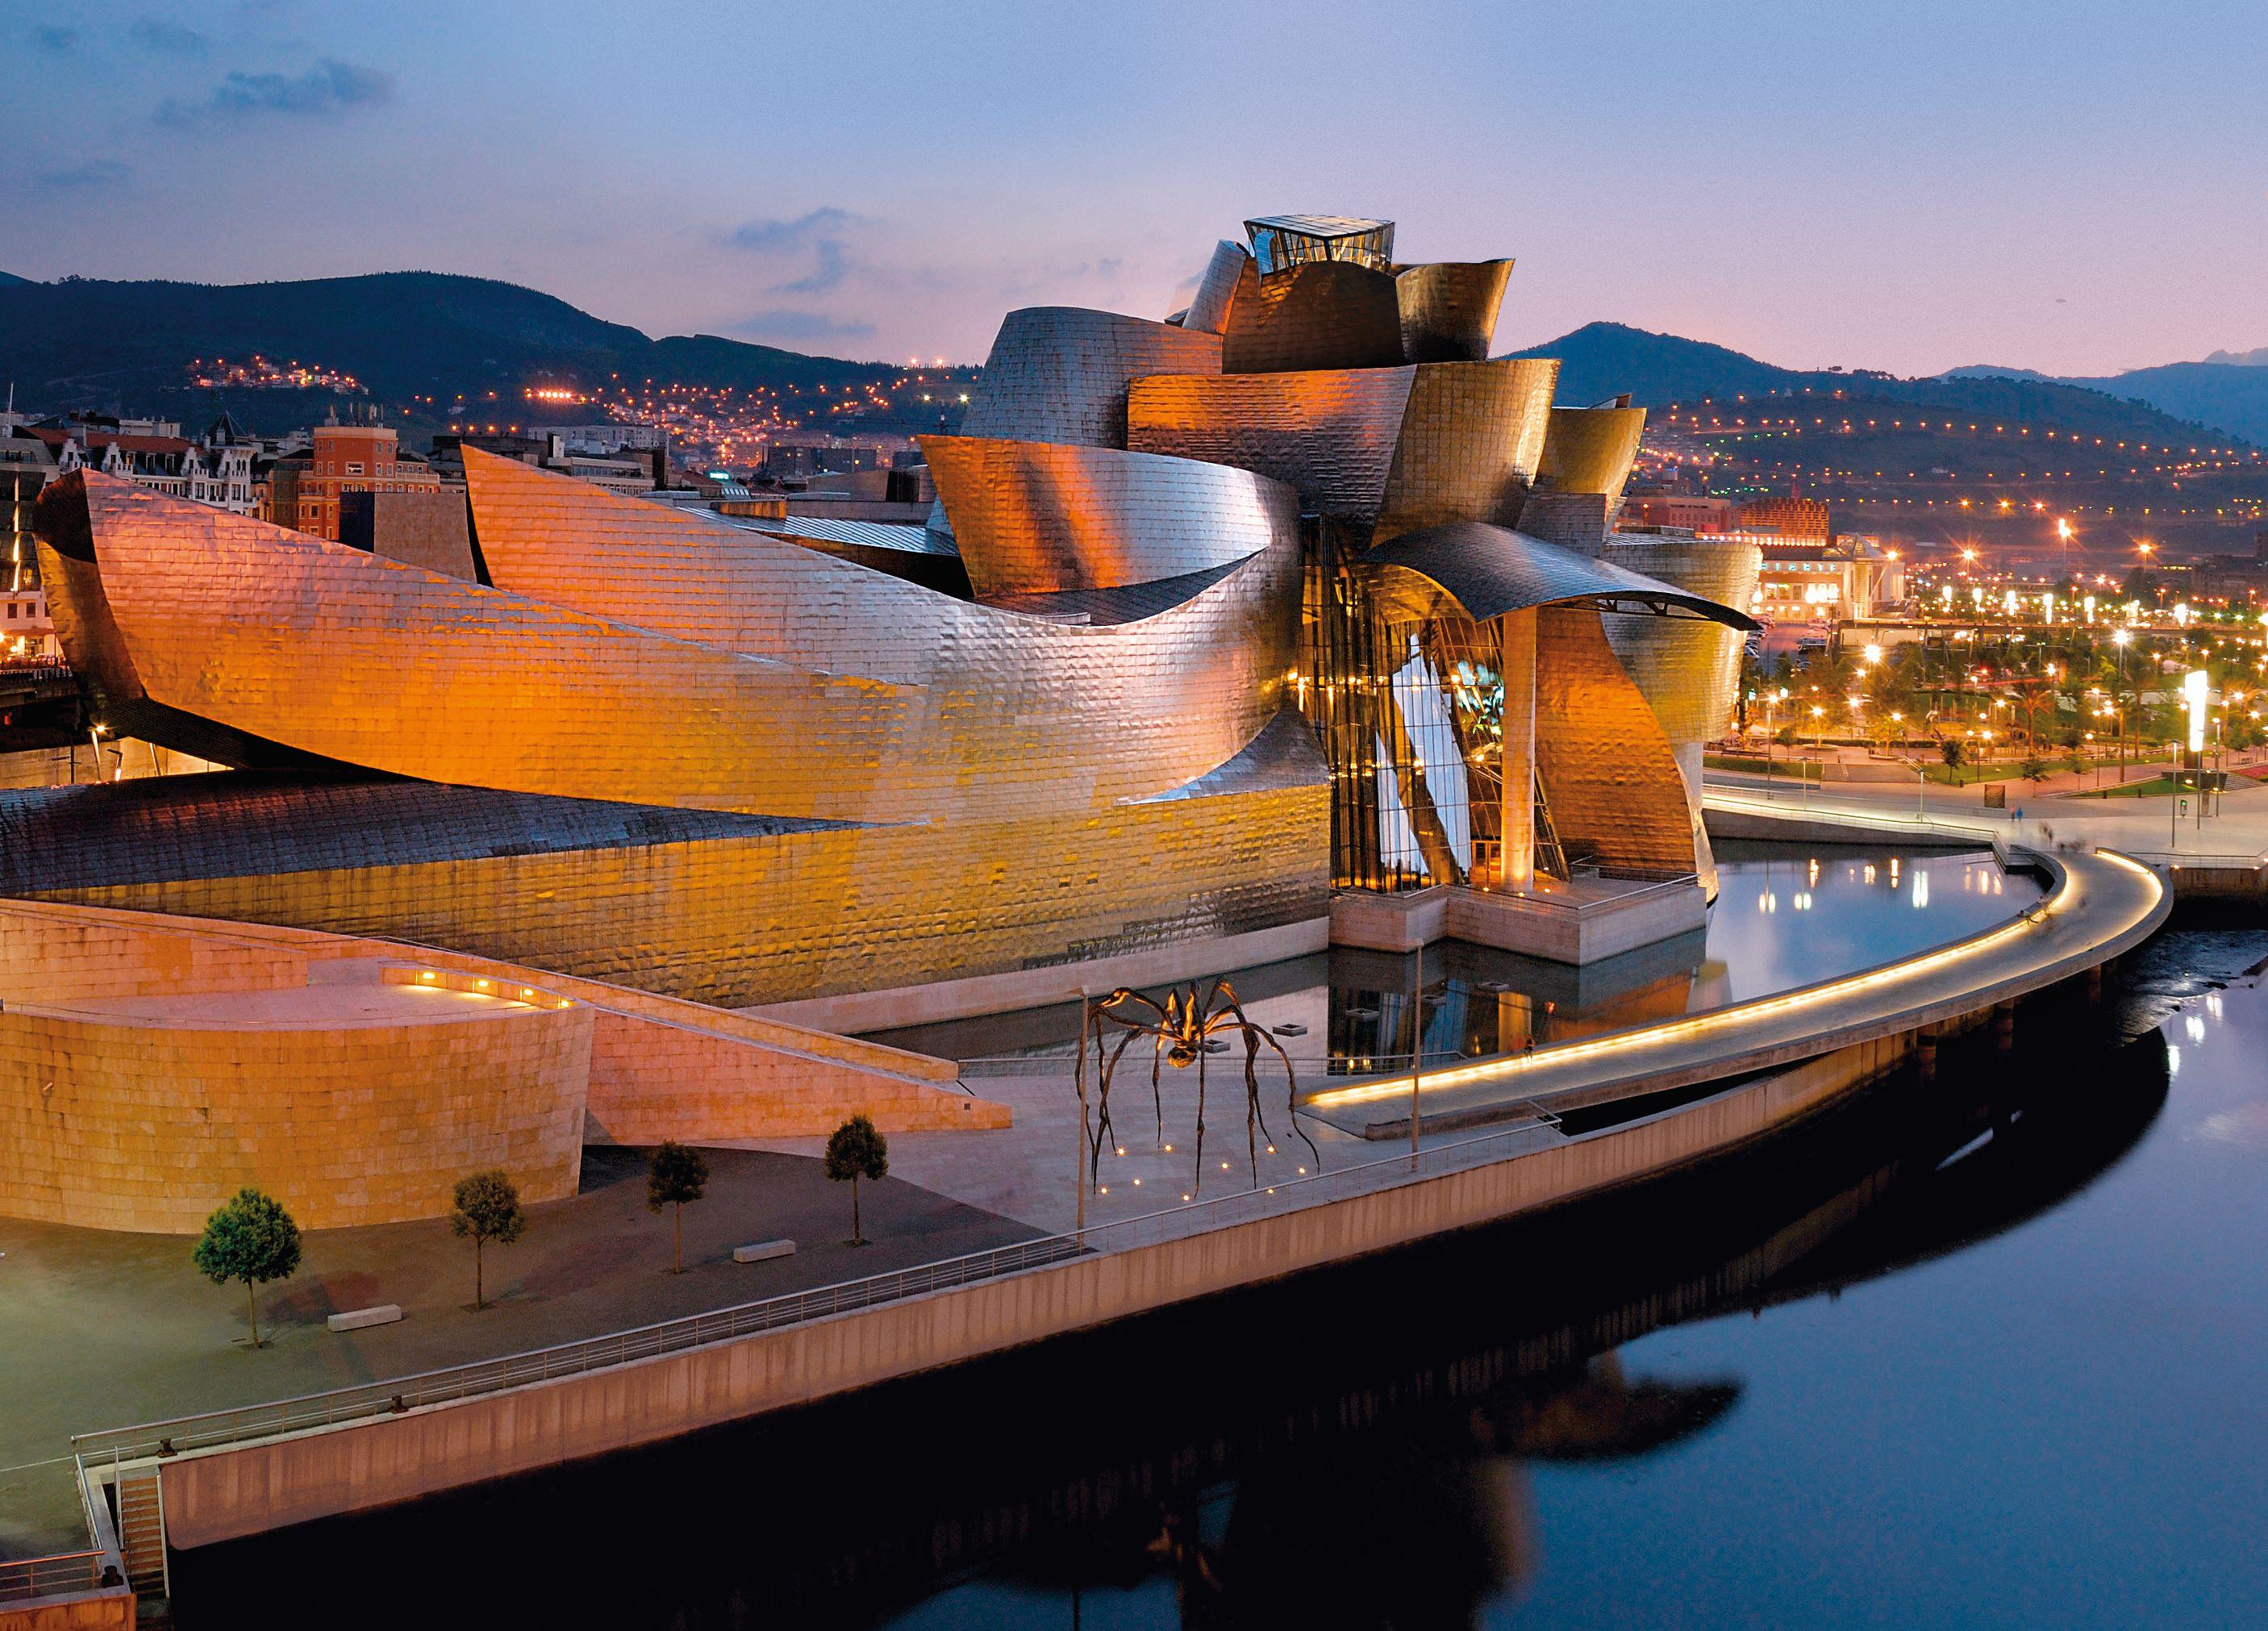 MSEUROPA_OceanSun_Bilbao